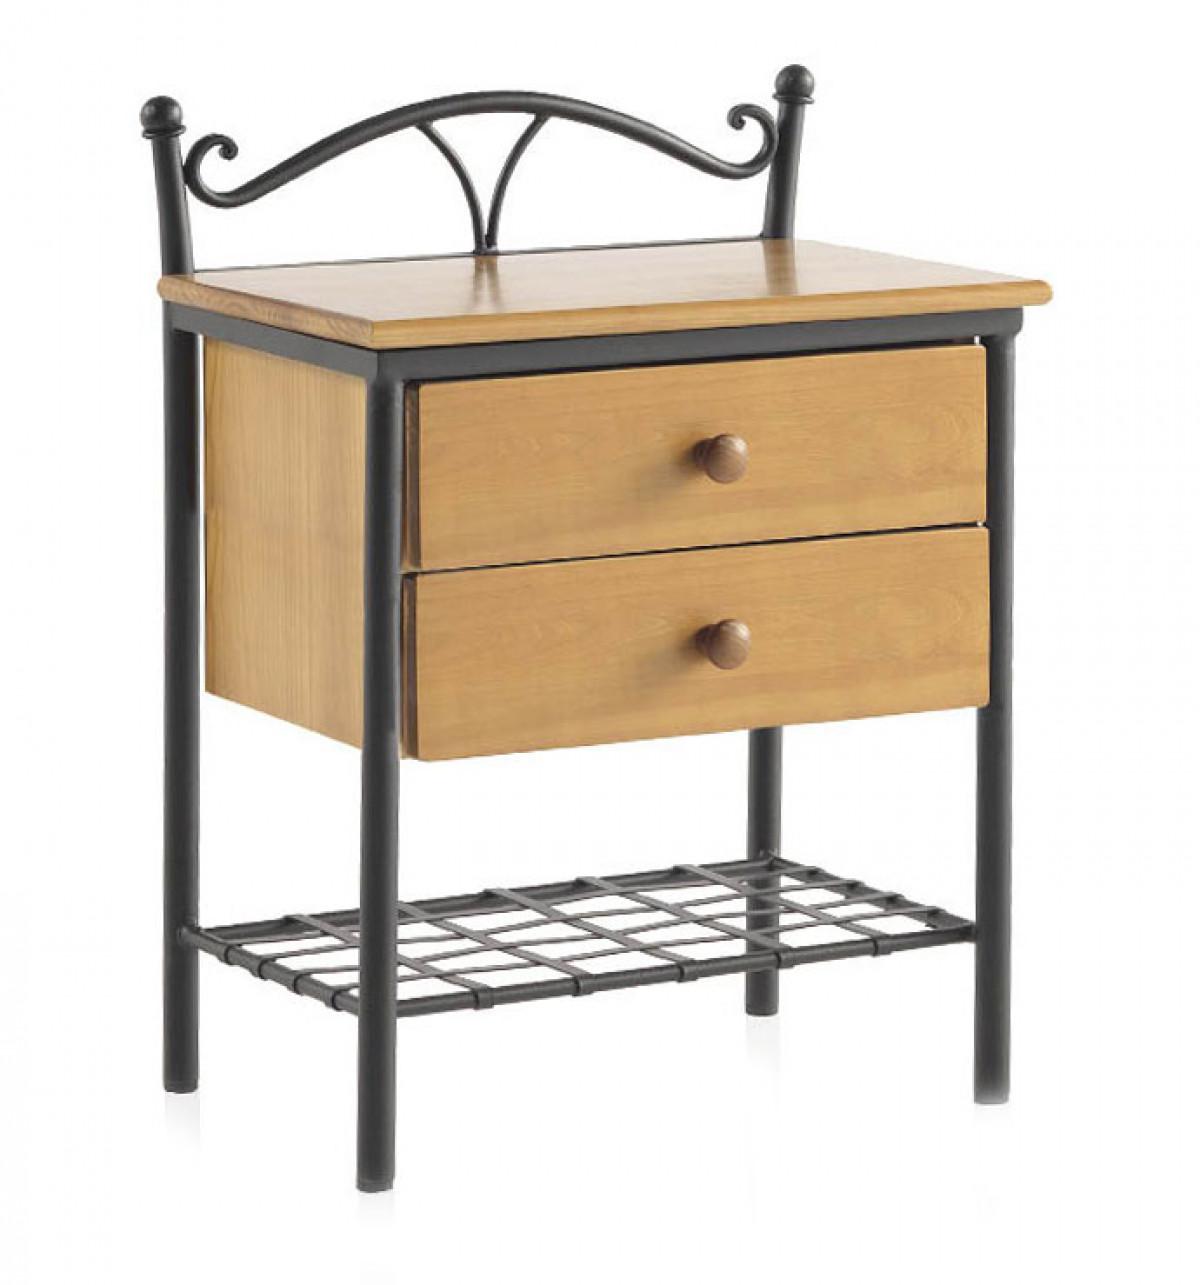 elioza chevet metal et bois personnalisable 2 tiroirs